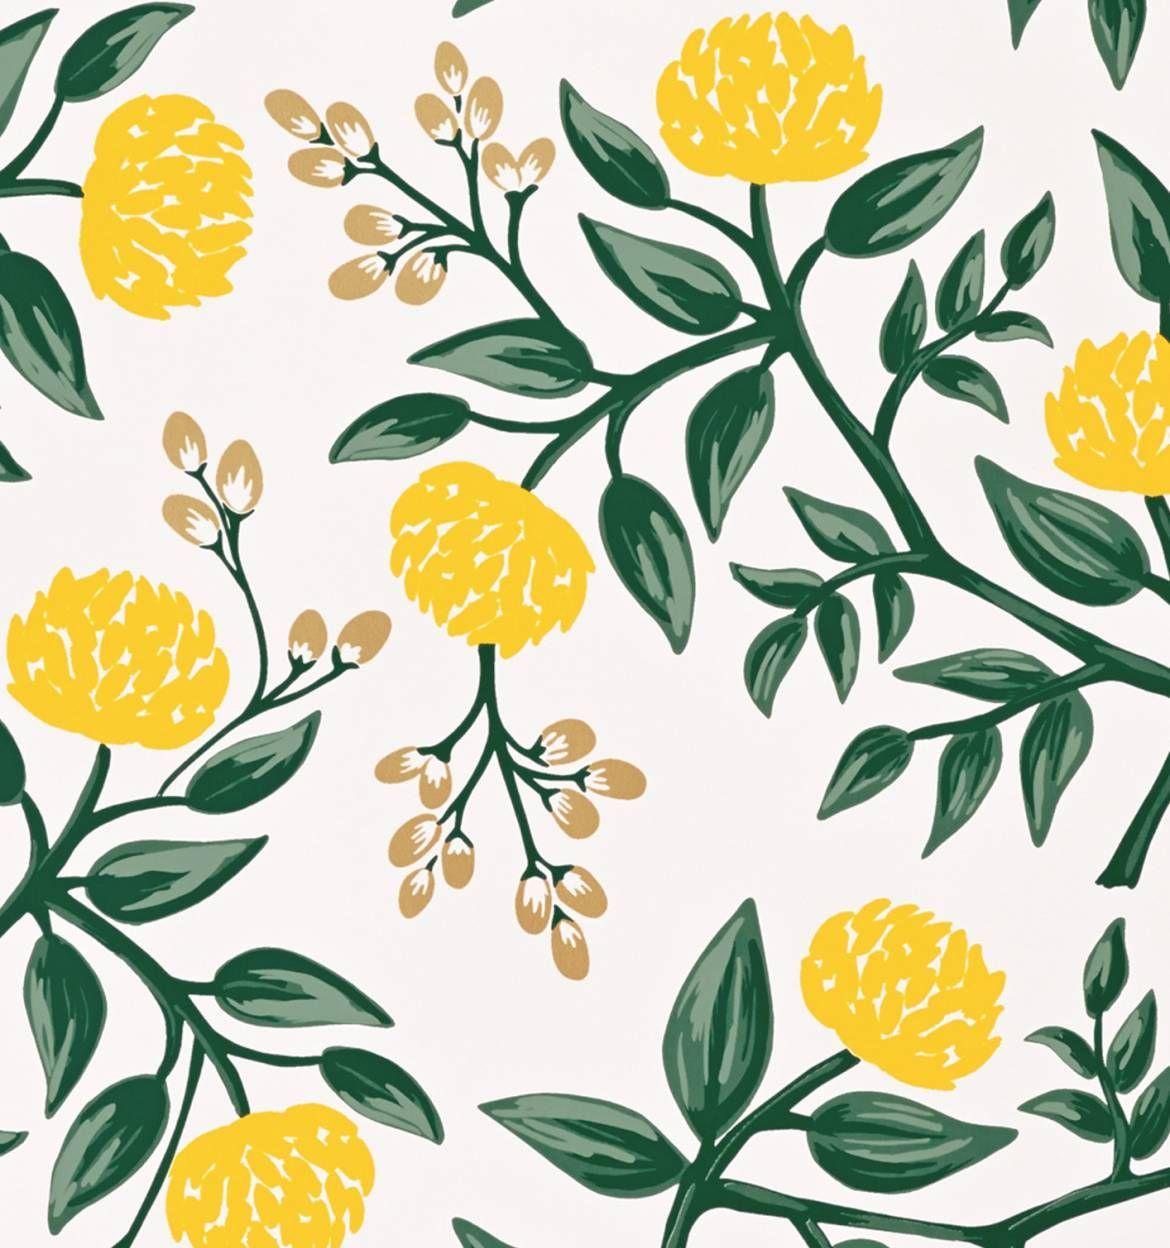 Peonies (Yellow) Wallpaper Rifle paper company, Rifle